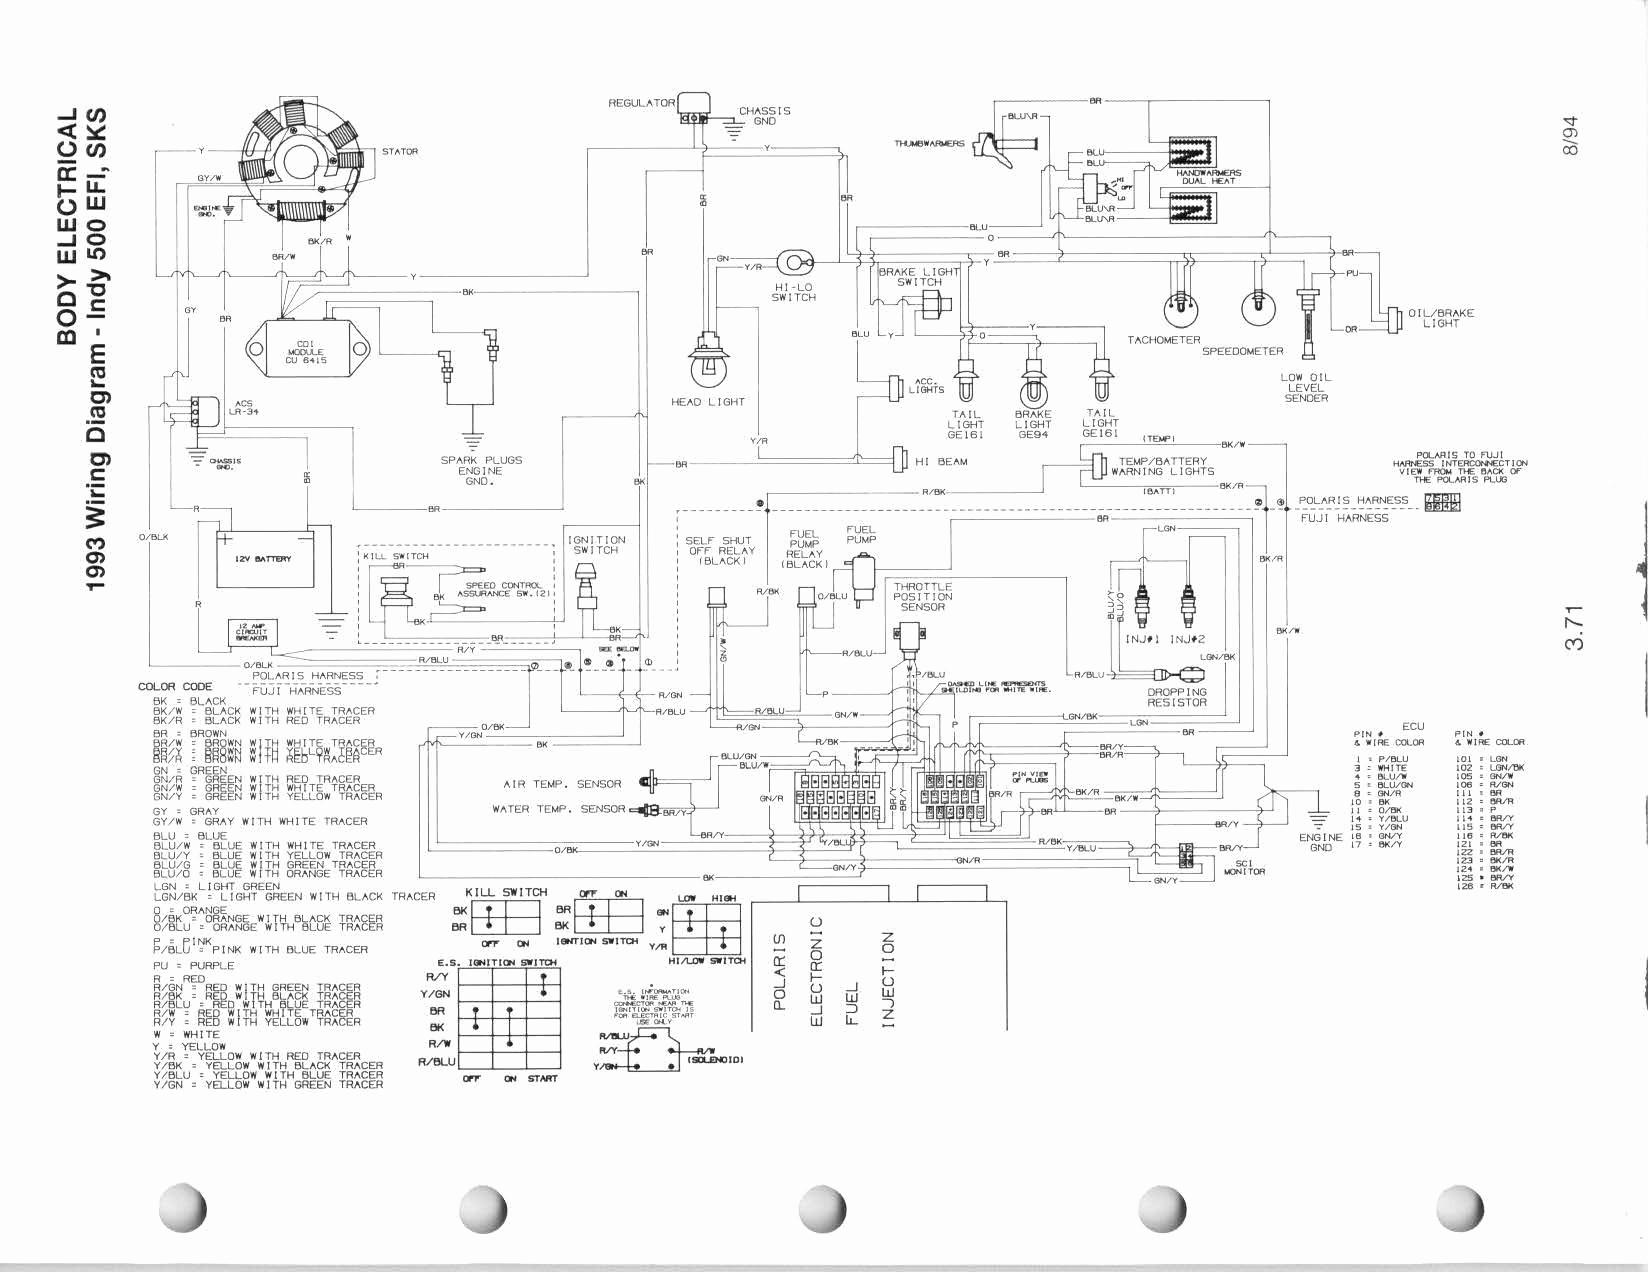 Wiring Diagrams Archives Page 65 Of 116 Binatanicom